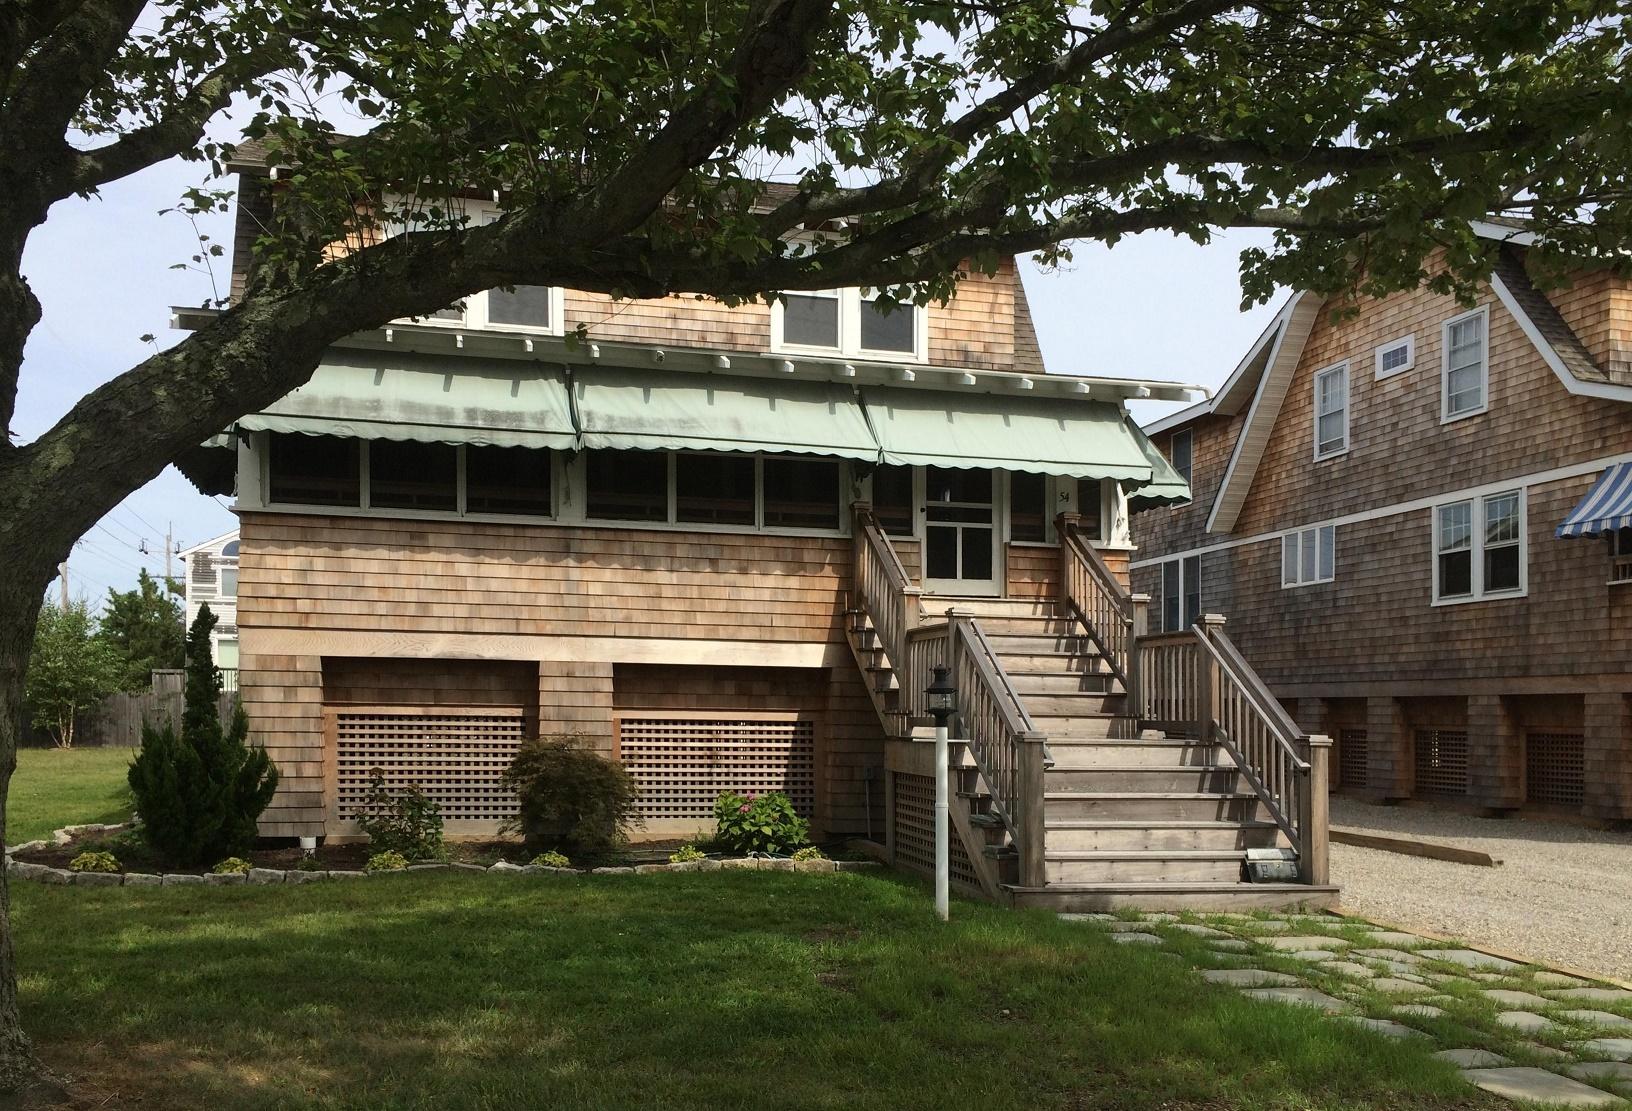 Richard Bubnowski Design LLC NJ raised house after Hurrican Sandy